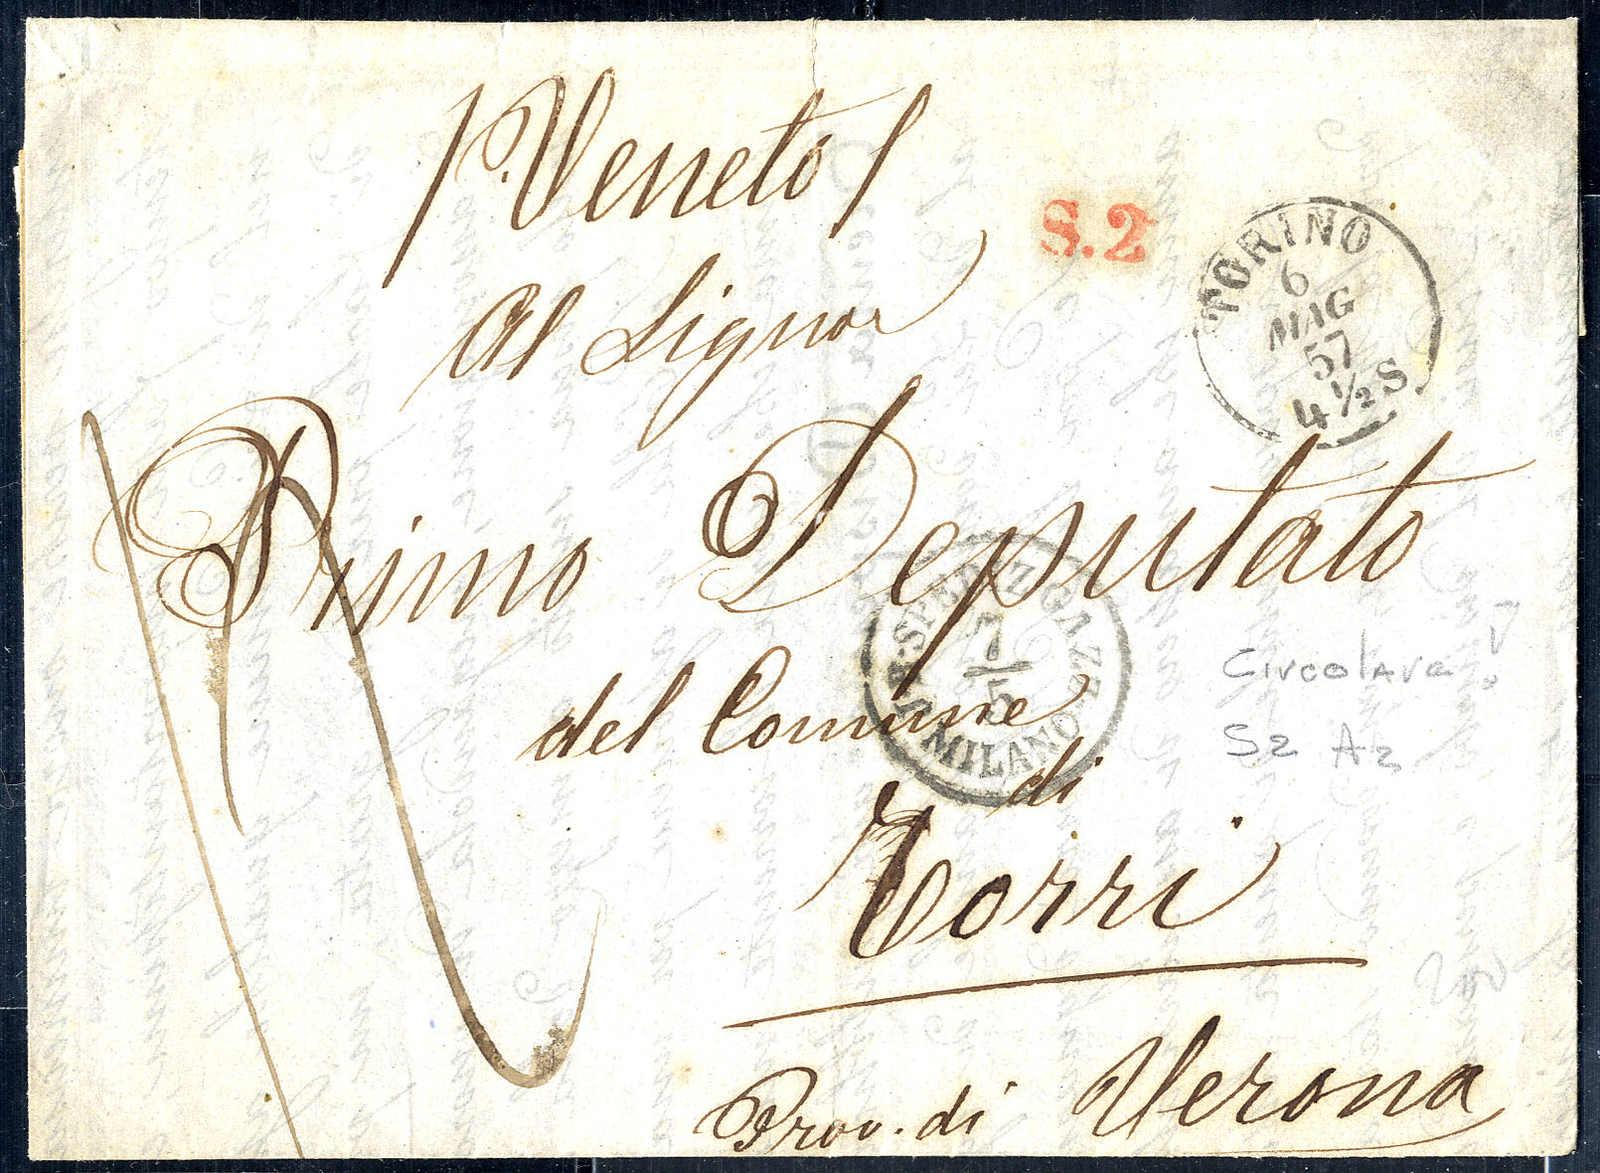 Lot 1580 - europe lombardy venetia -  Viennafil Auktionen 63rd LIVE AUCTION